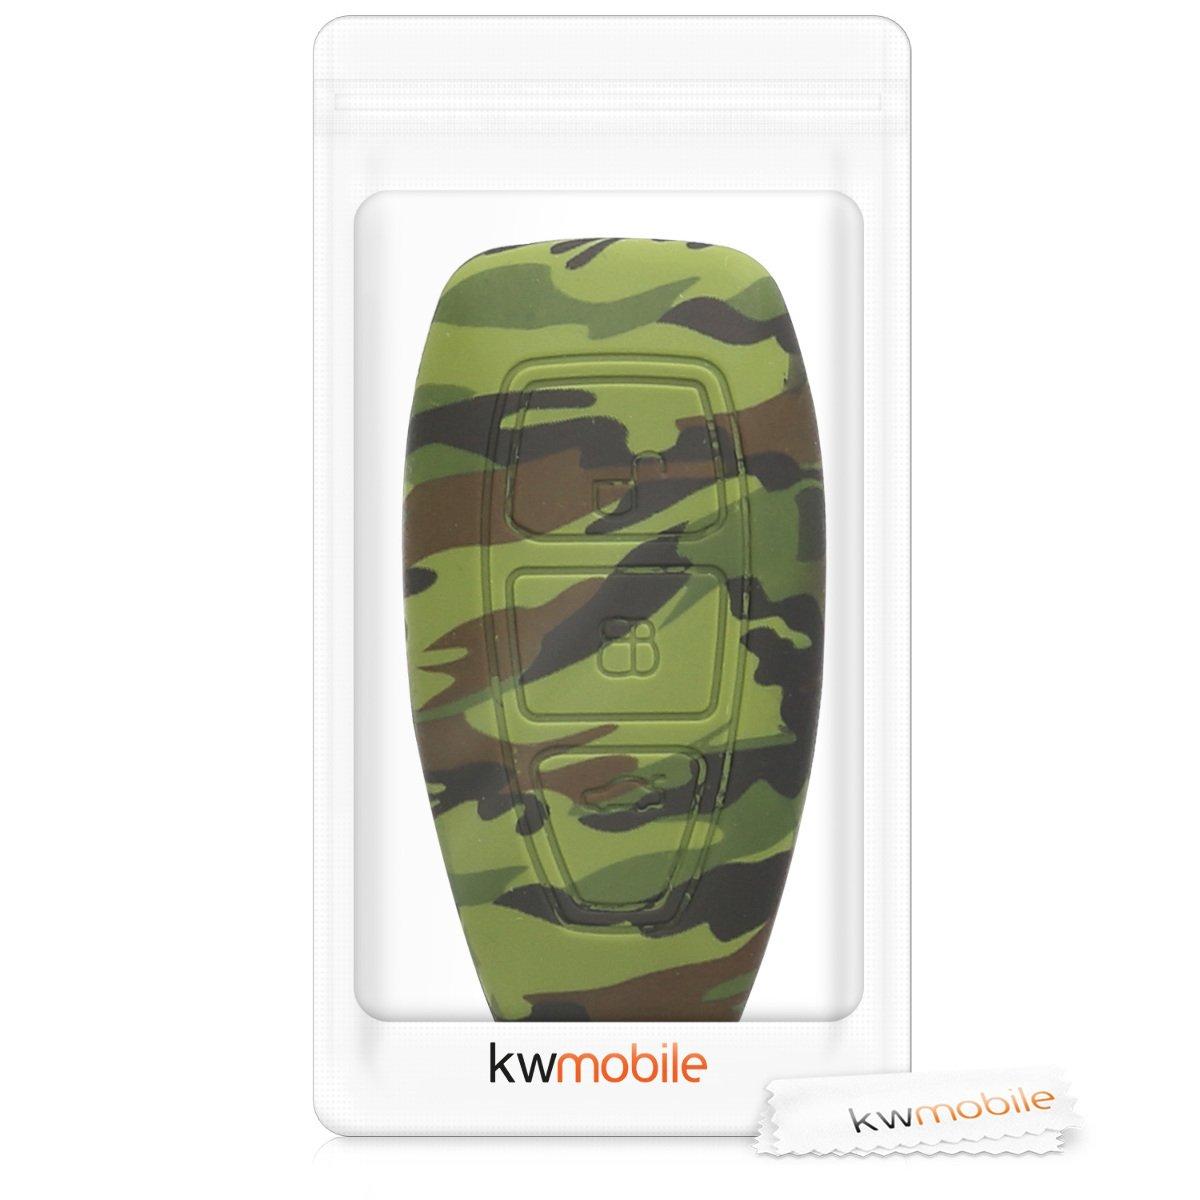 Carcasa Protectora Suave de kwmobile Funda para Llave Keyless Go de 3 Botones para Coche Ford Silicona - Case de Mando de Auto con dise/ño de Varias Estrellas